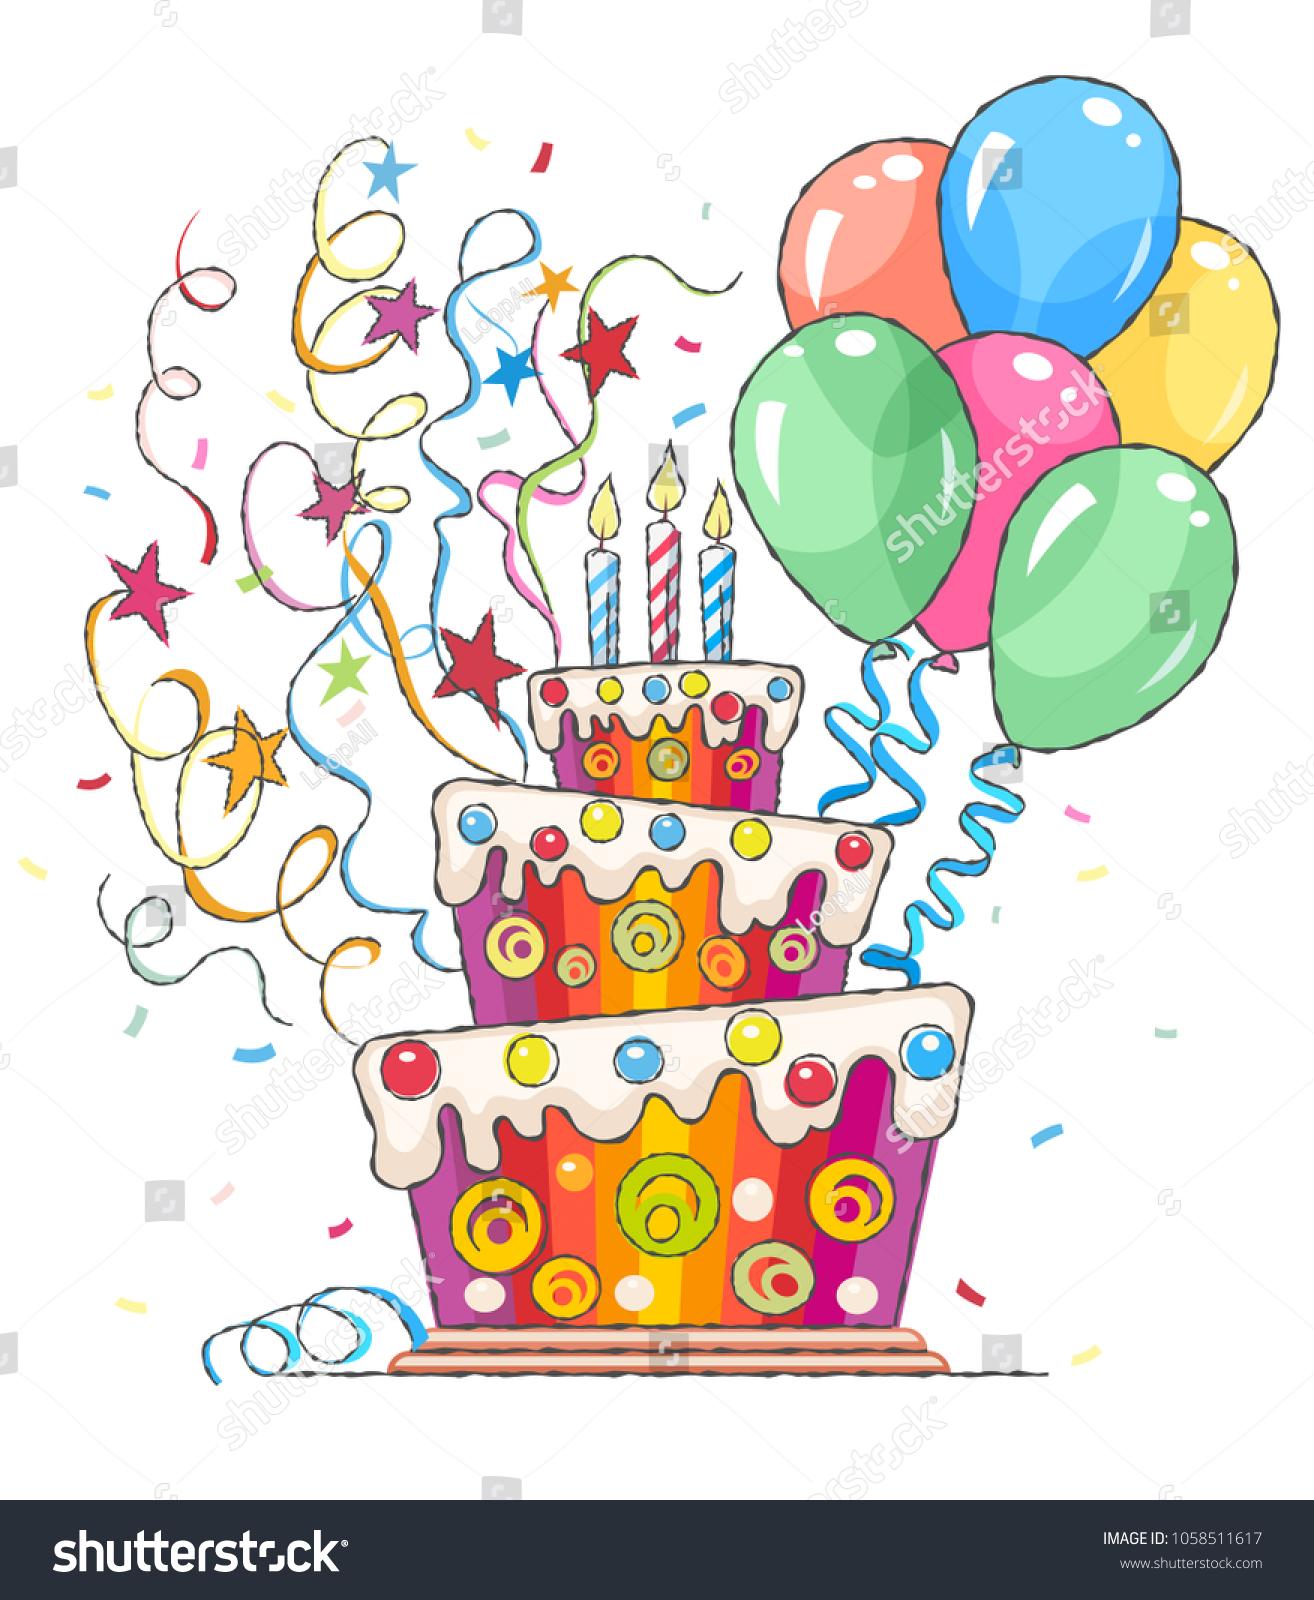 Birthday Cake Balloons Greetings Holiday Sweet Stock Vector Royalty